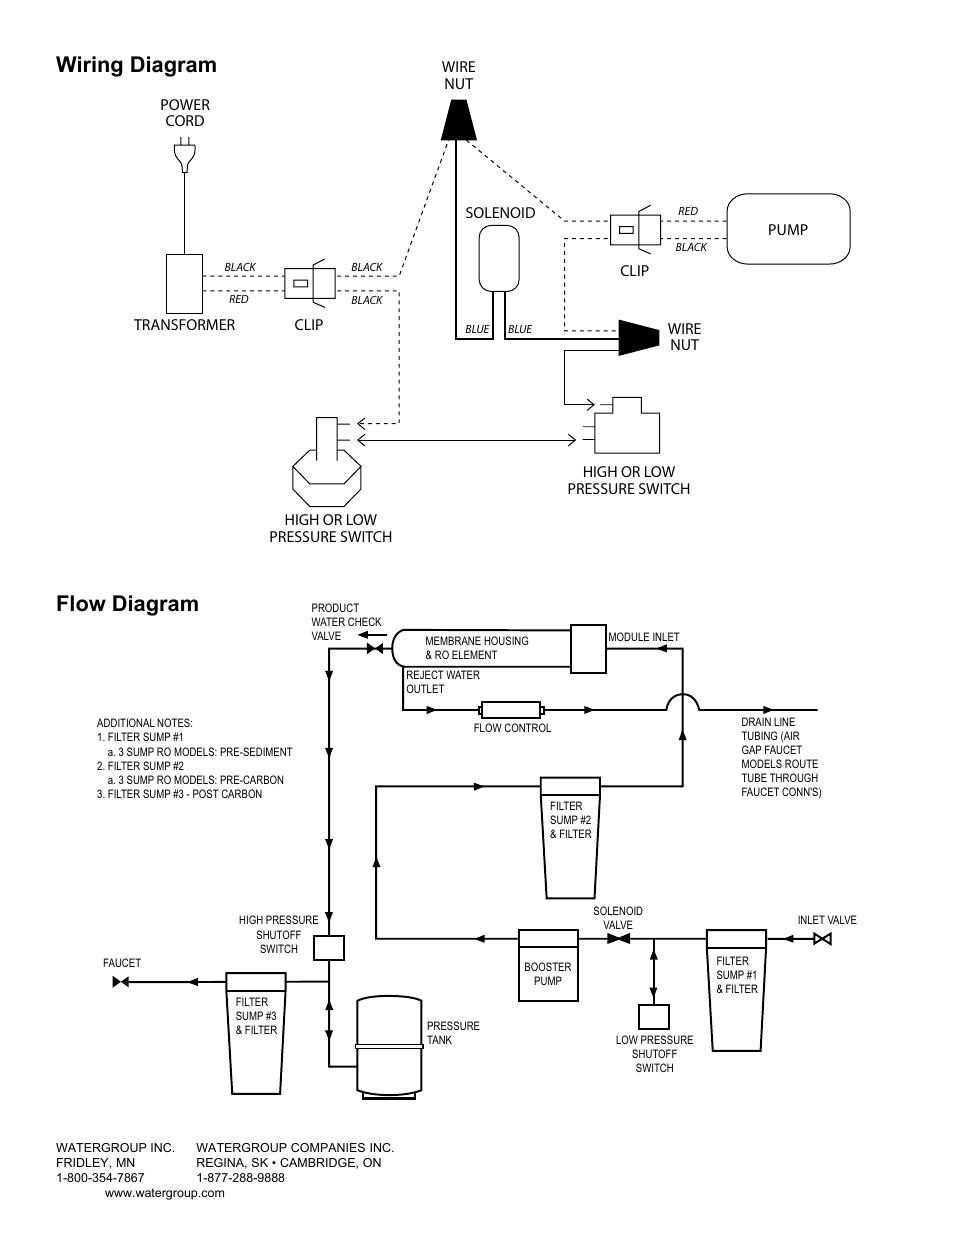 Diagram Desiel 3 Post Solenoid Wiring Diagram Full Version Hd Quality Wiring Diagram Classdiagramchegg Blimunde It